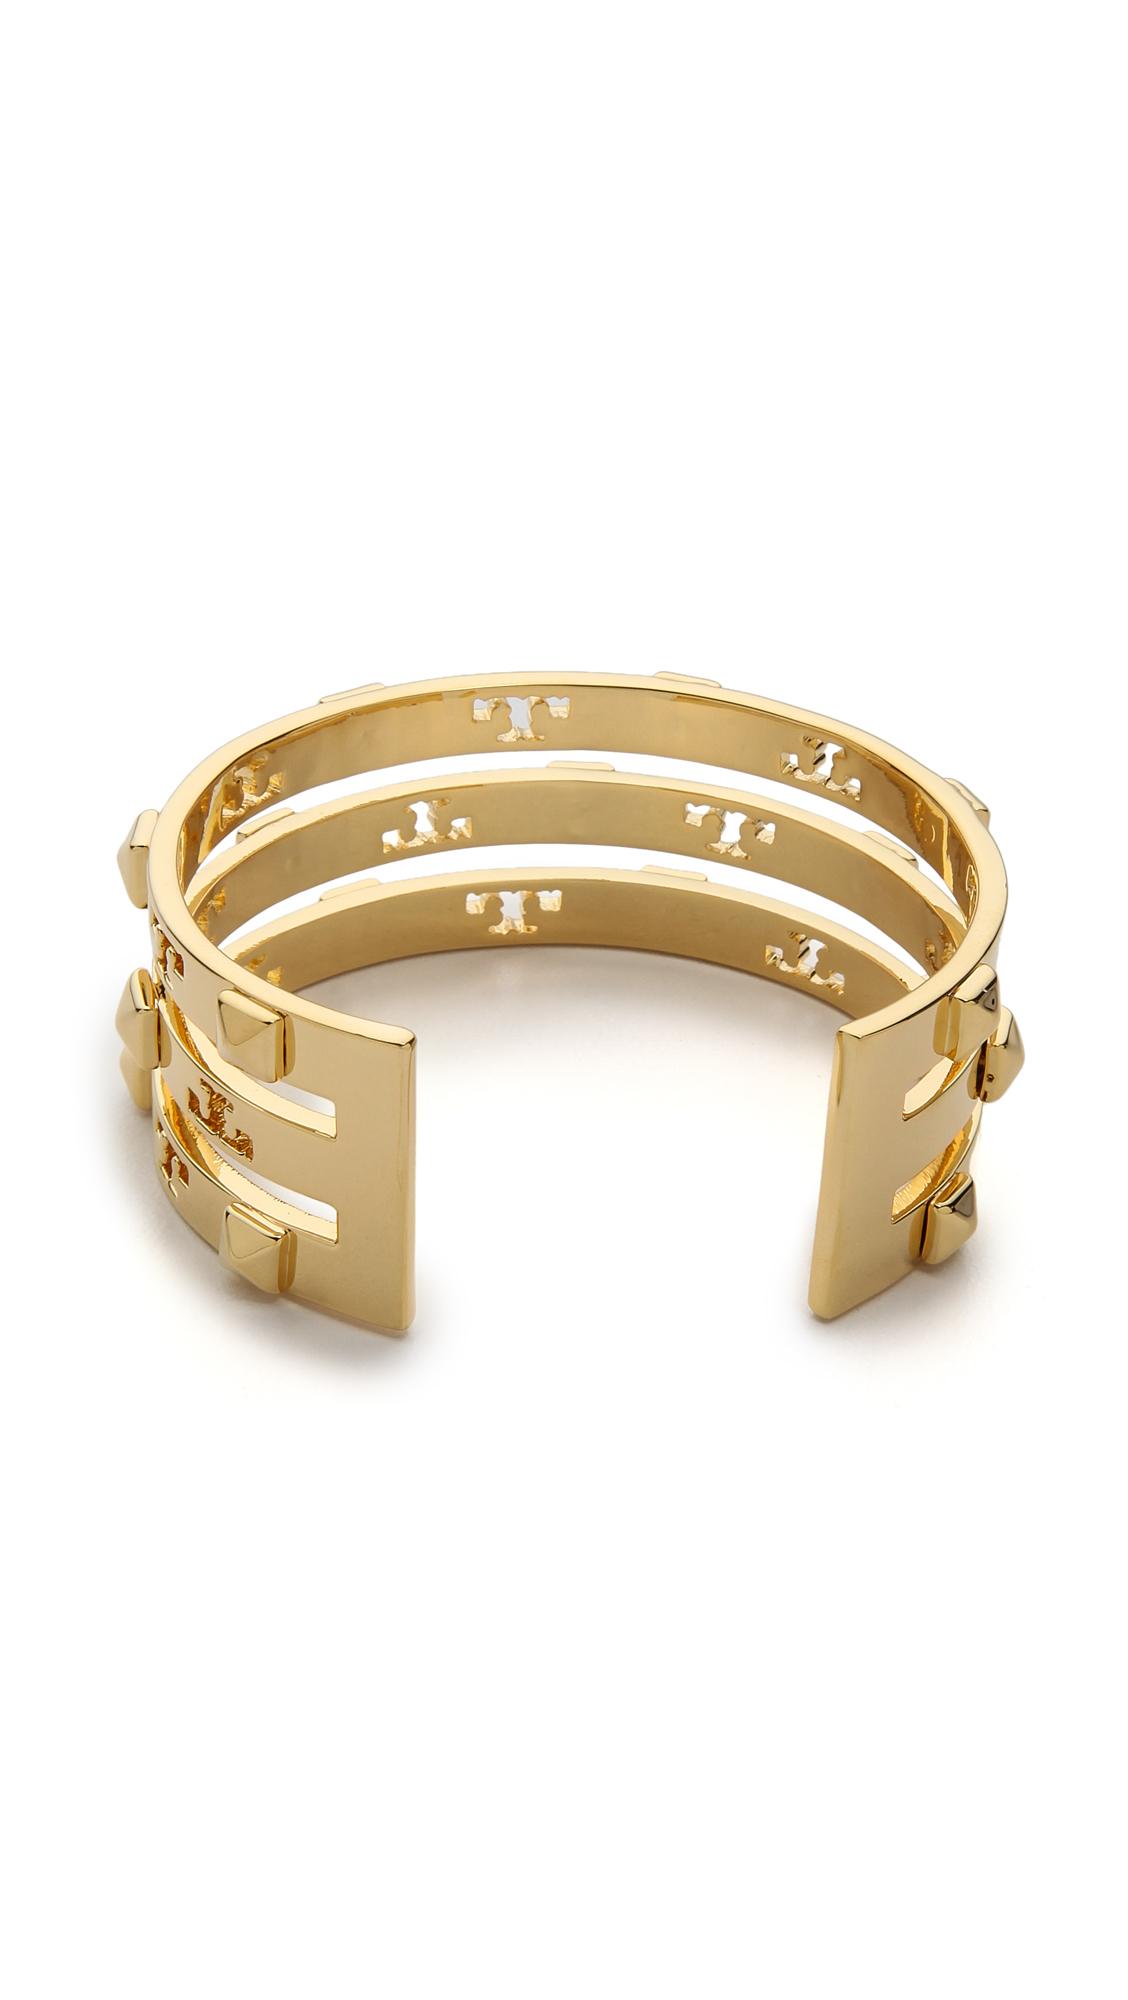 fdced0125dd Tory Burch Stacked Logo Stud Cuff Bracelet Shiny Gold in Metallic - Lyst